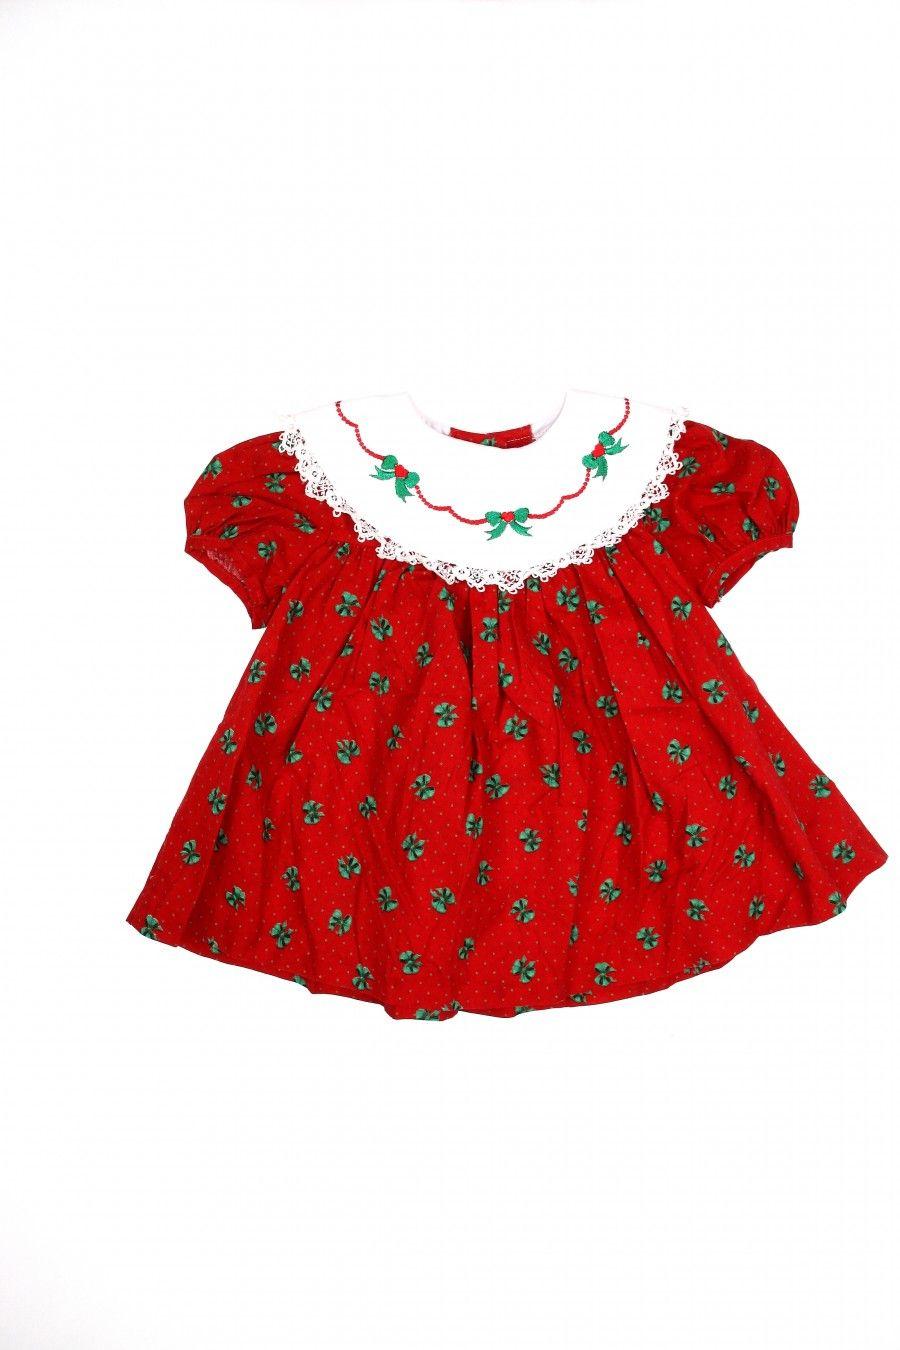 S Nursery Rhyme Short Dress Size 12